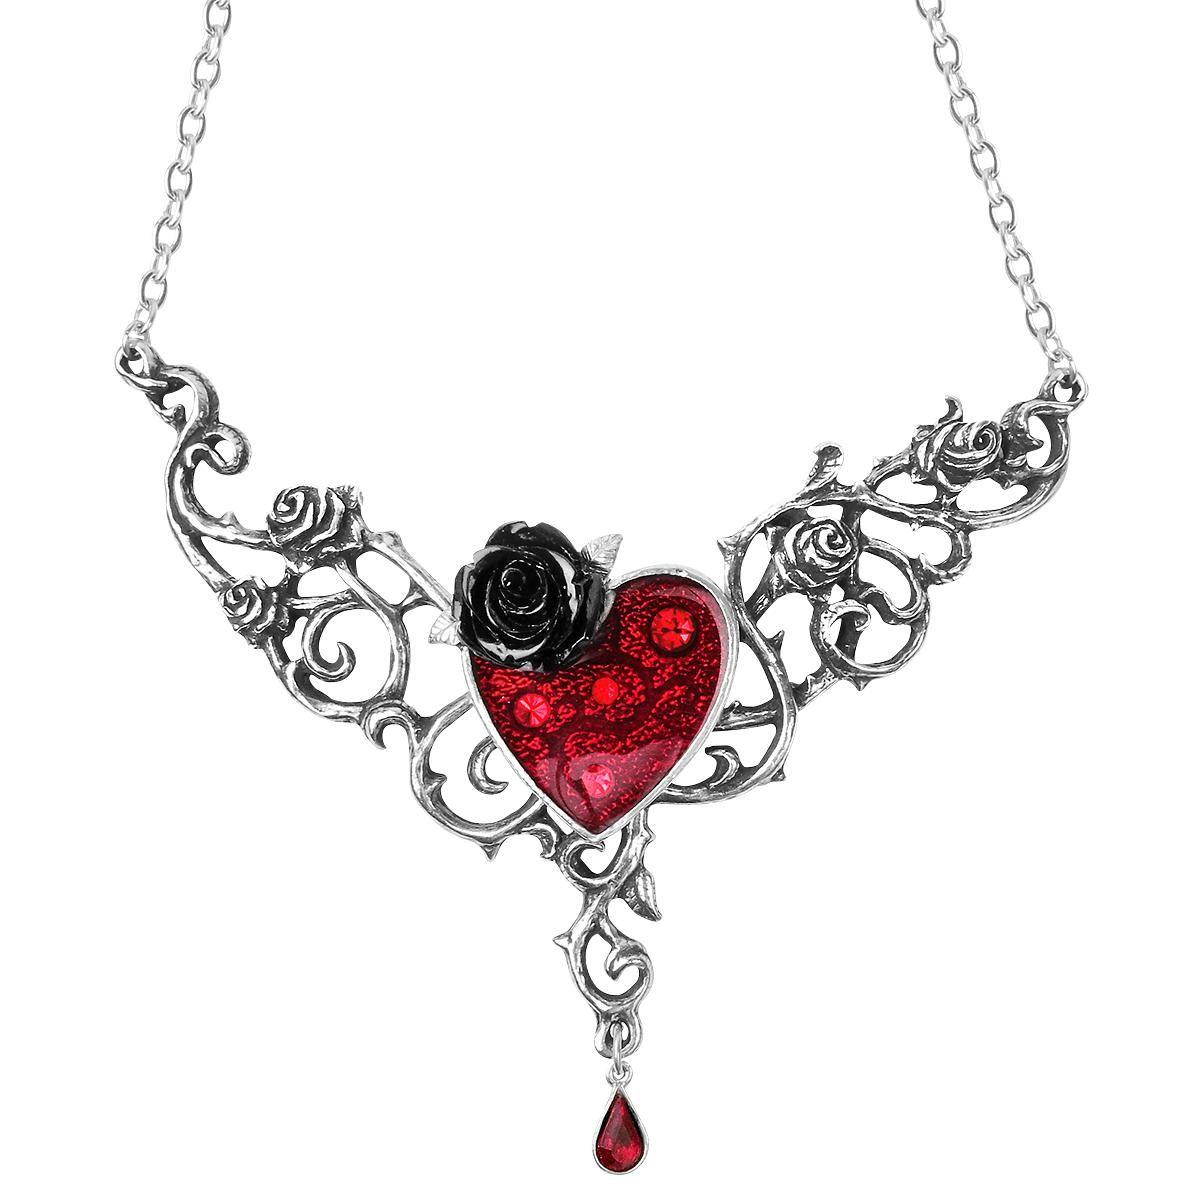 Blood Rose Heart   Gothic jewelry, Heart jewelry, Goth jewelry